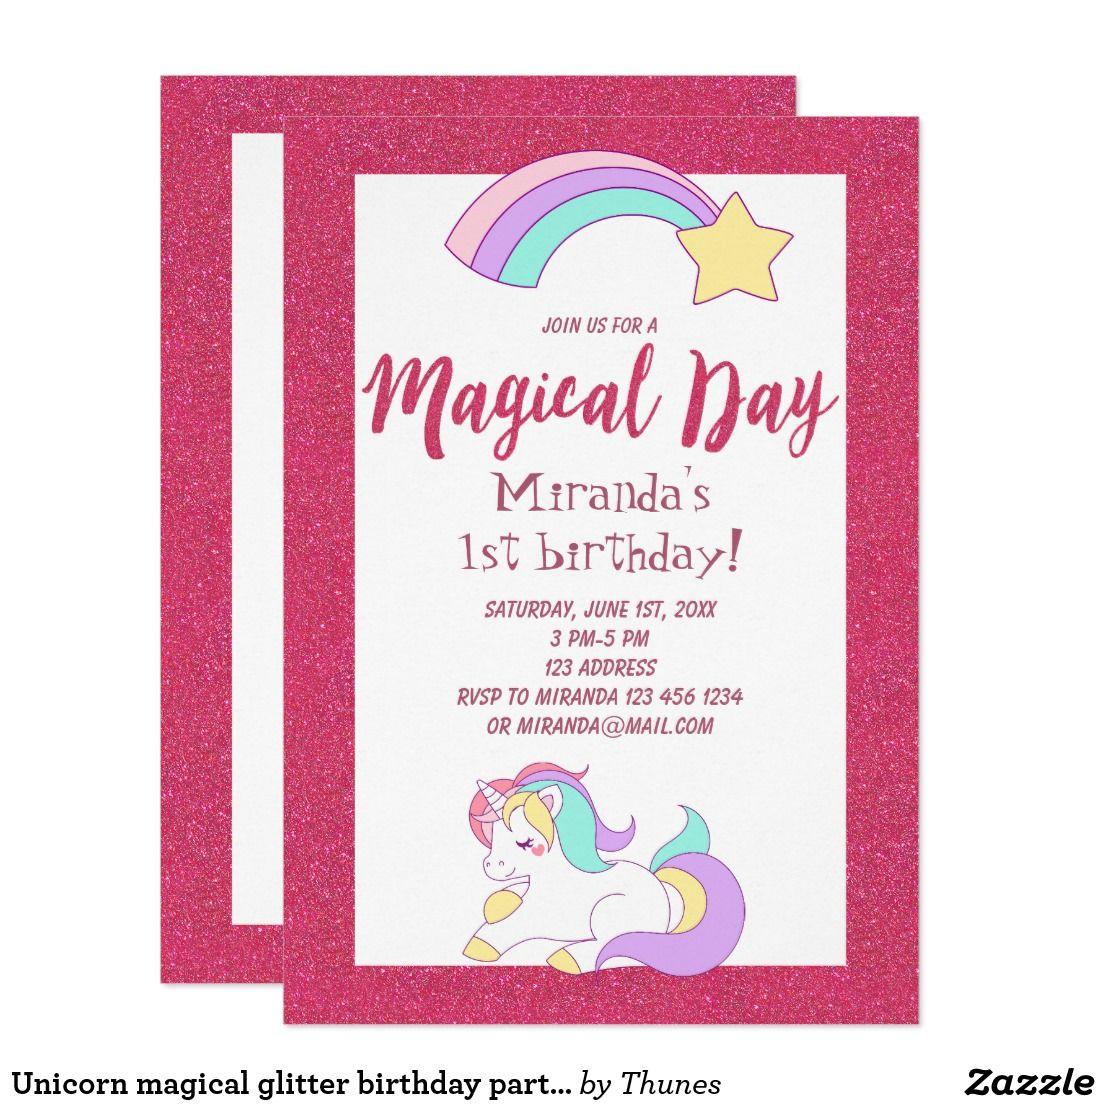 Unicorn magical glitter birthday party invitation glitter birthday unicorn magical glitter birthday party invitation stopboris Choice Image